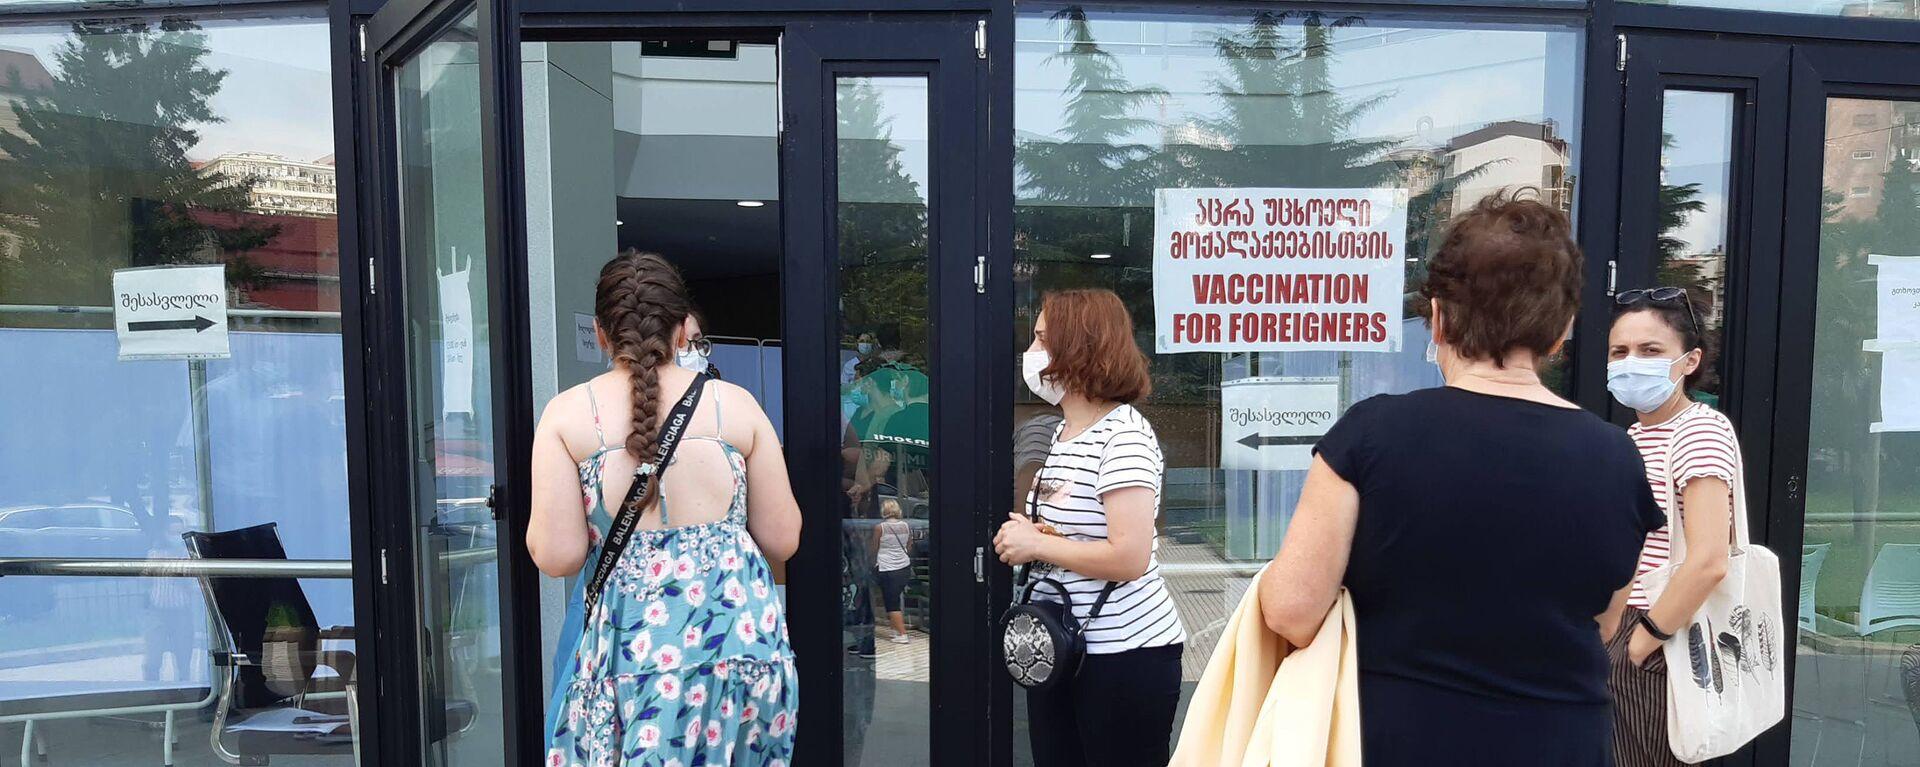 Эпидемия коронавируса - вакцинация в Аджарии - Sputnik Грузия, 1920, 20.08.2021